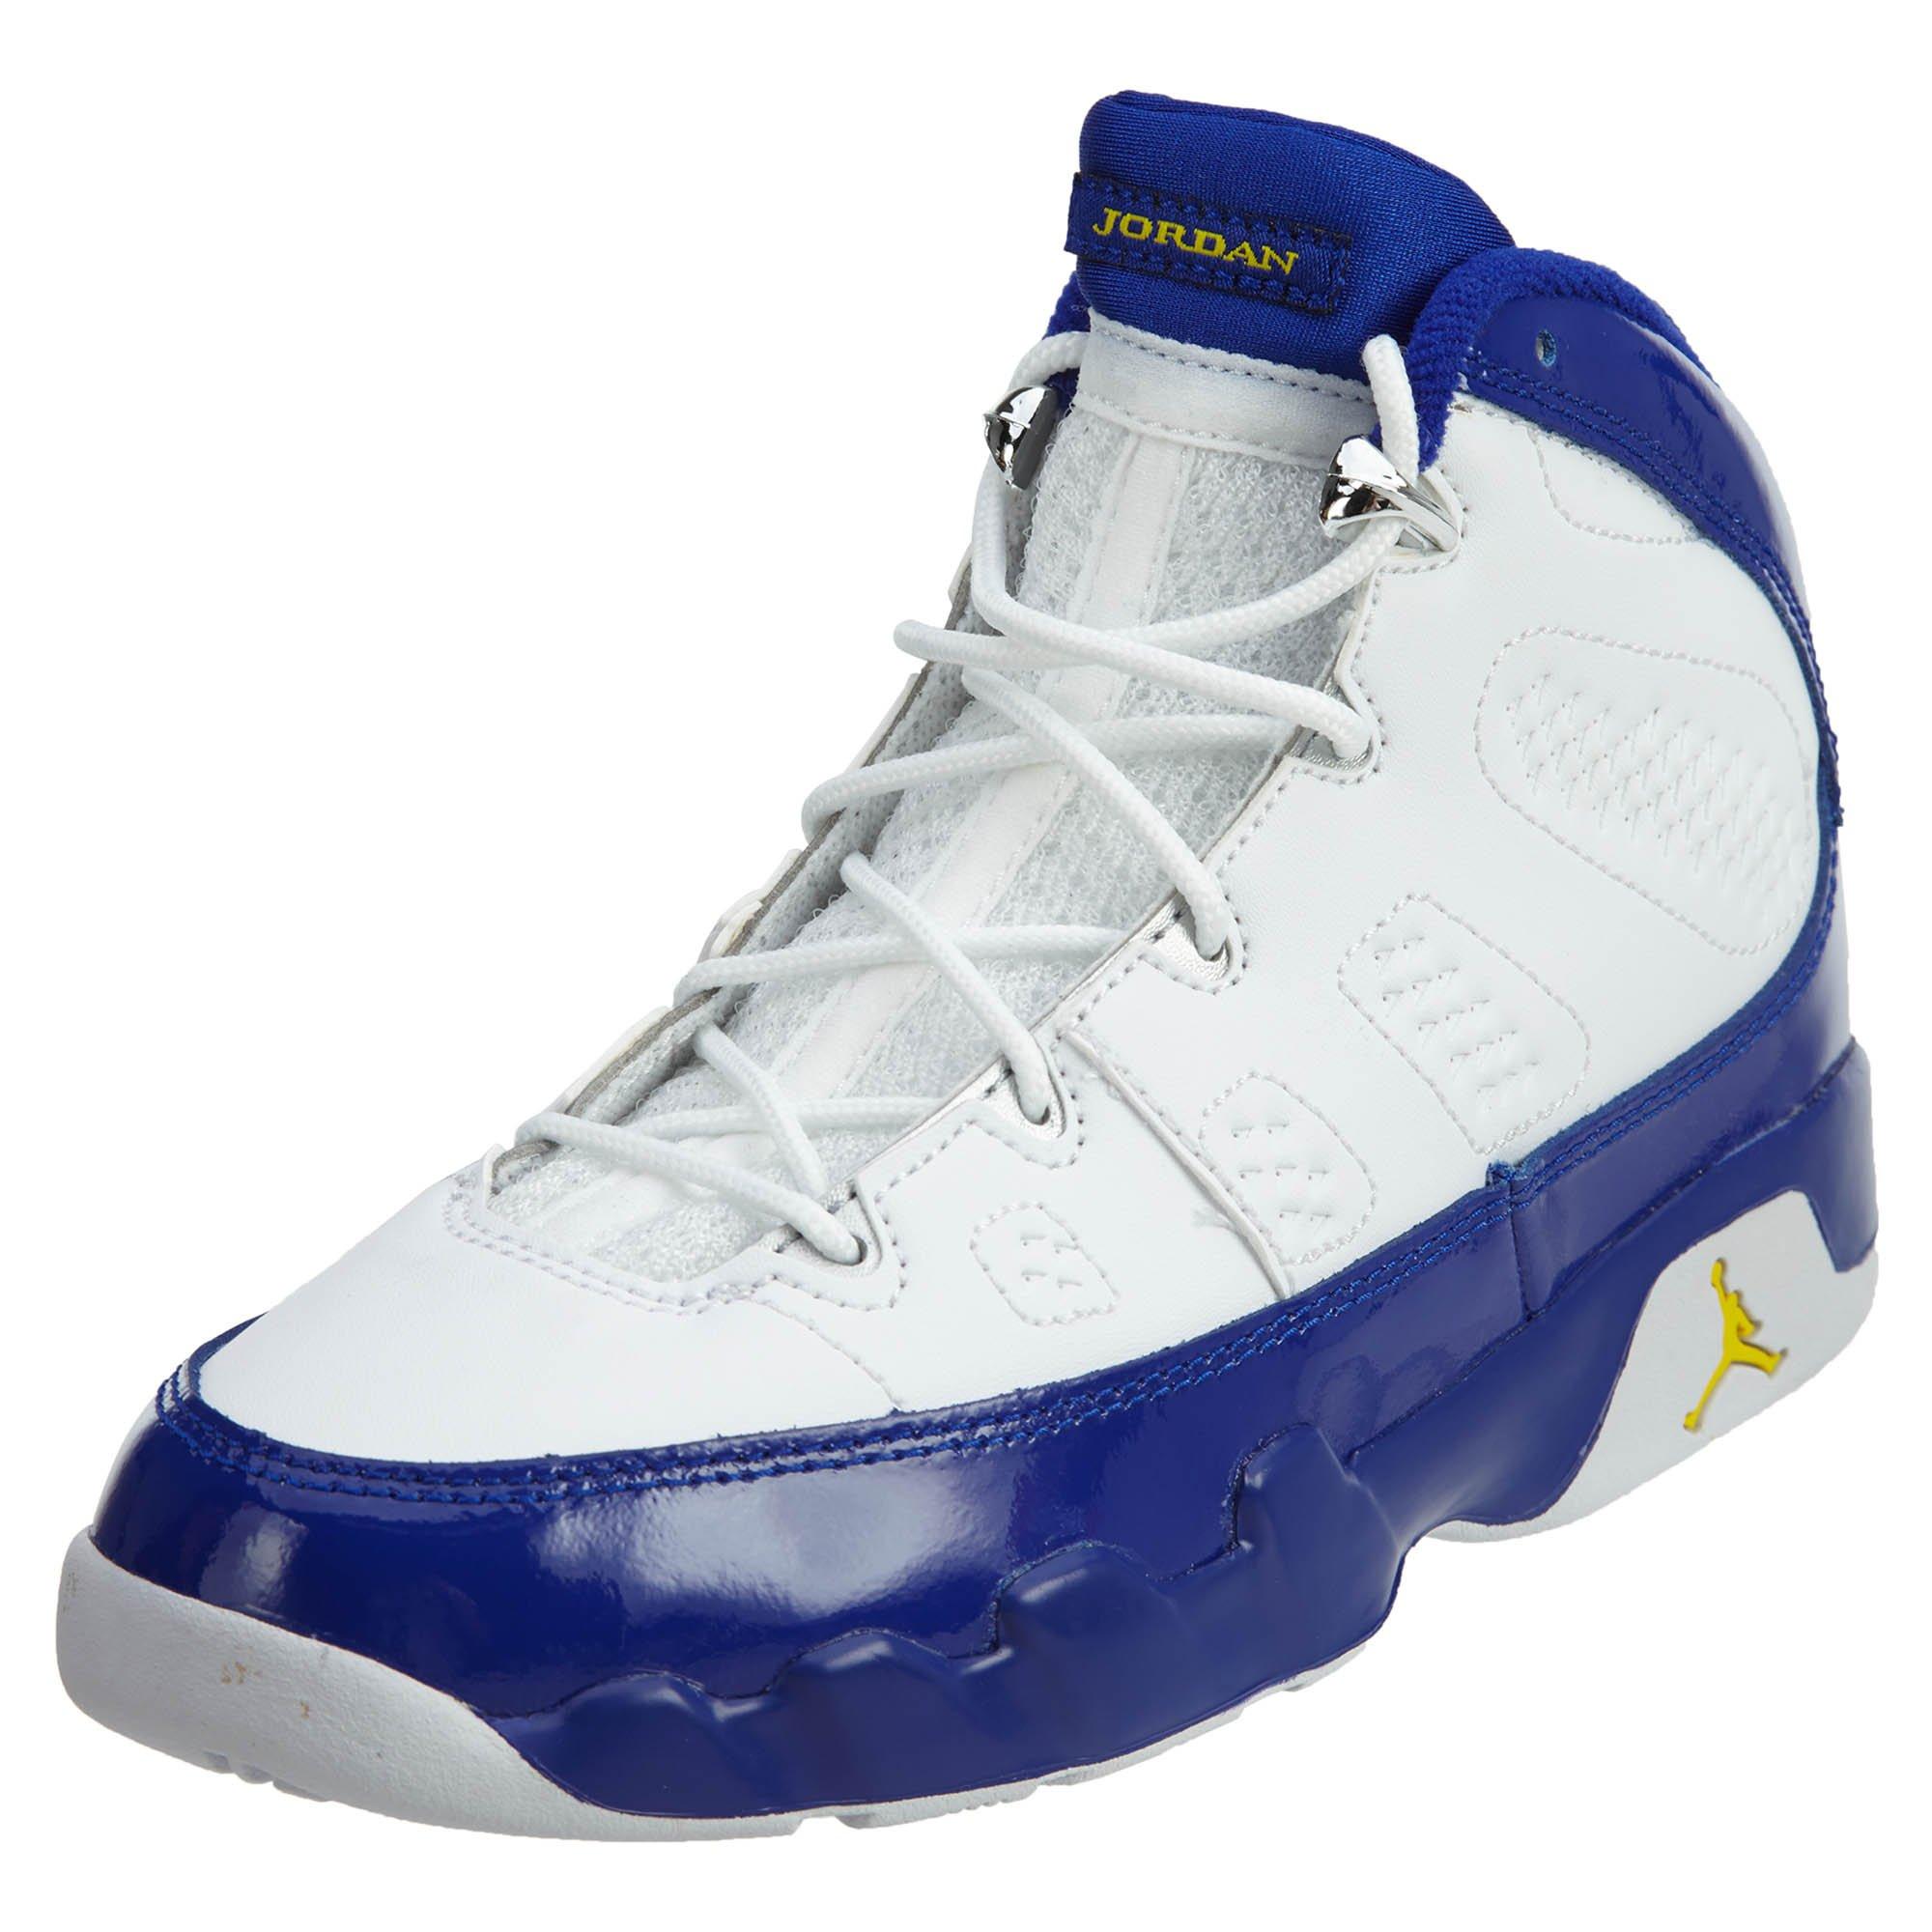 Jordan 9 Retro Little Kids Style: 401811-121 Size: 1.5